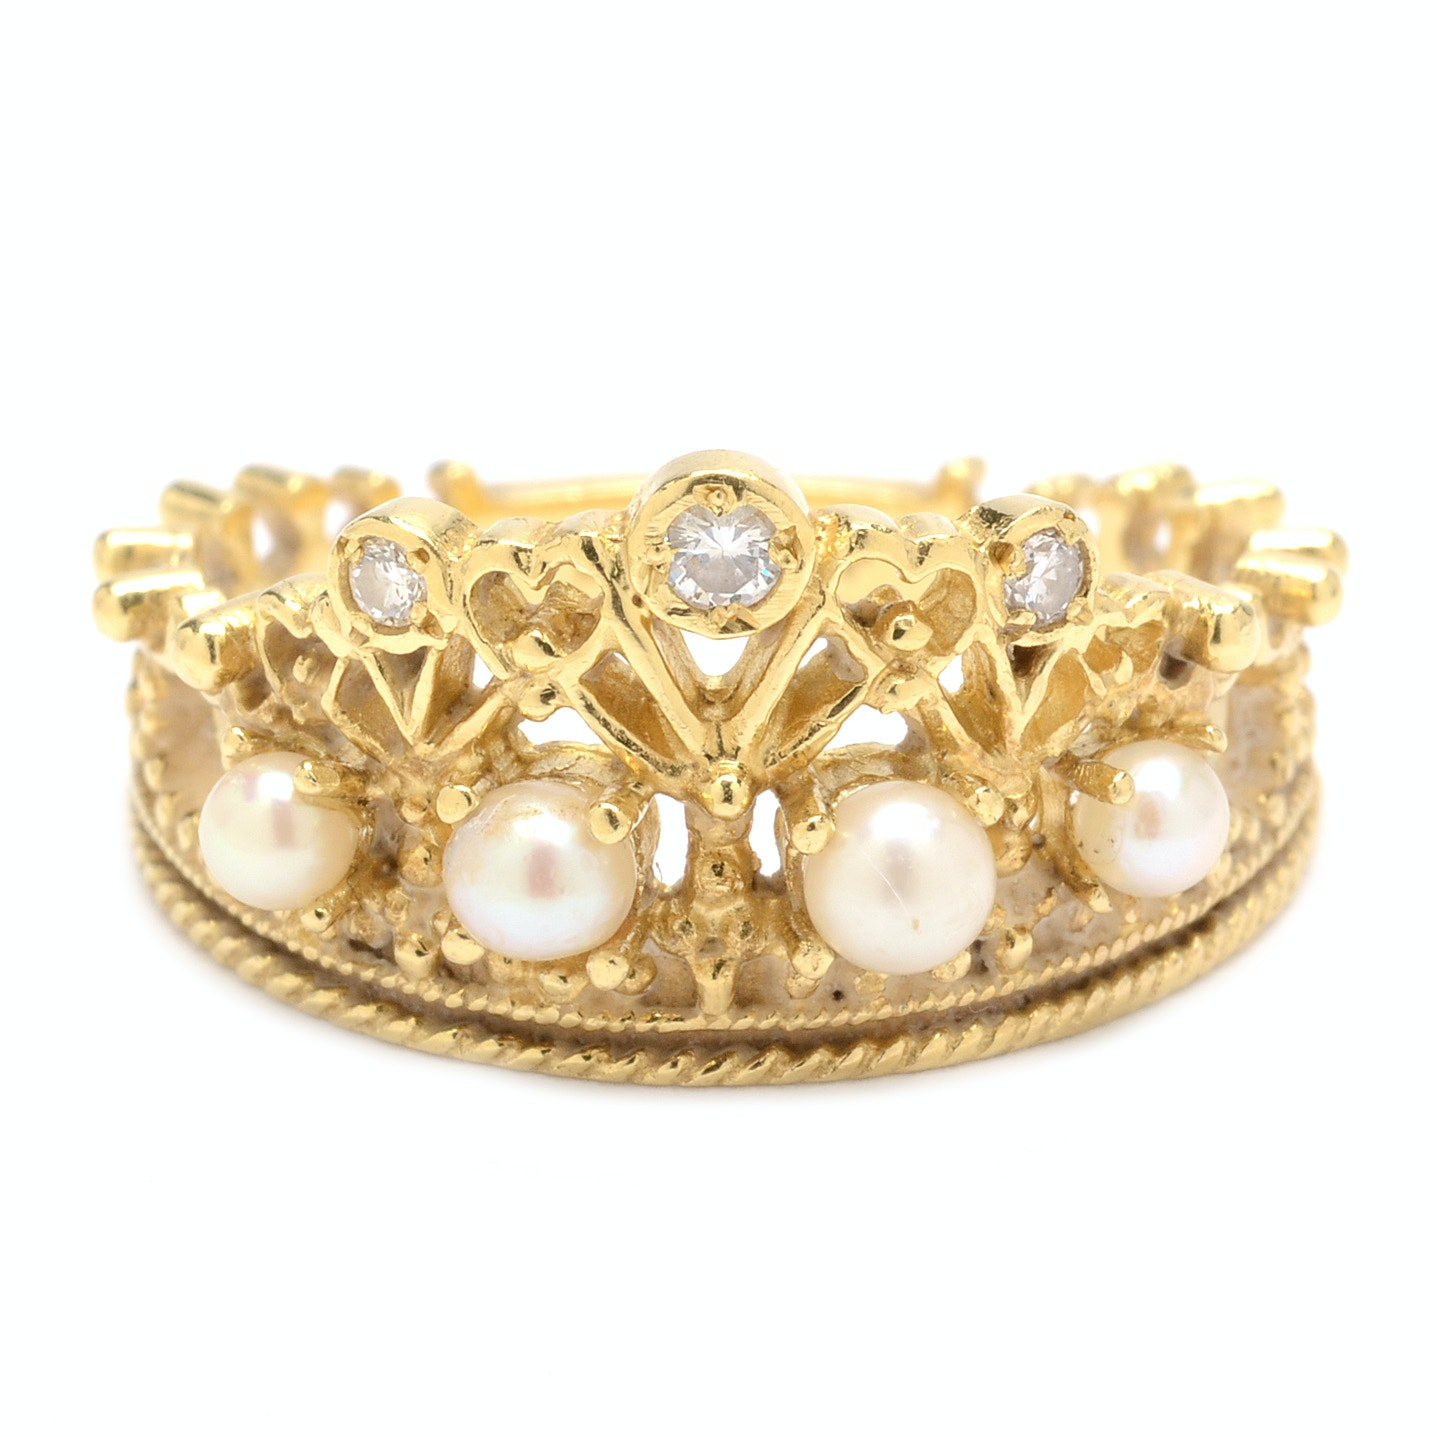 18K Gold Diamond and Pearl Franklin Mint Princess Diana Tiara Ring